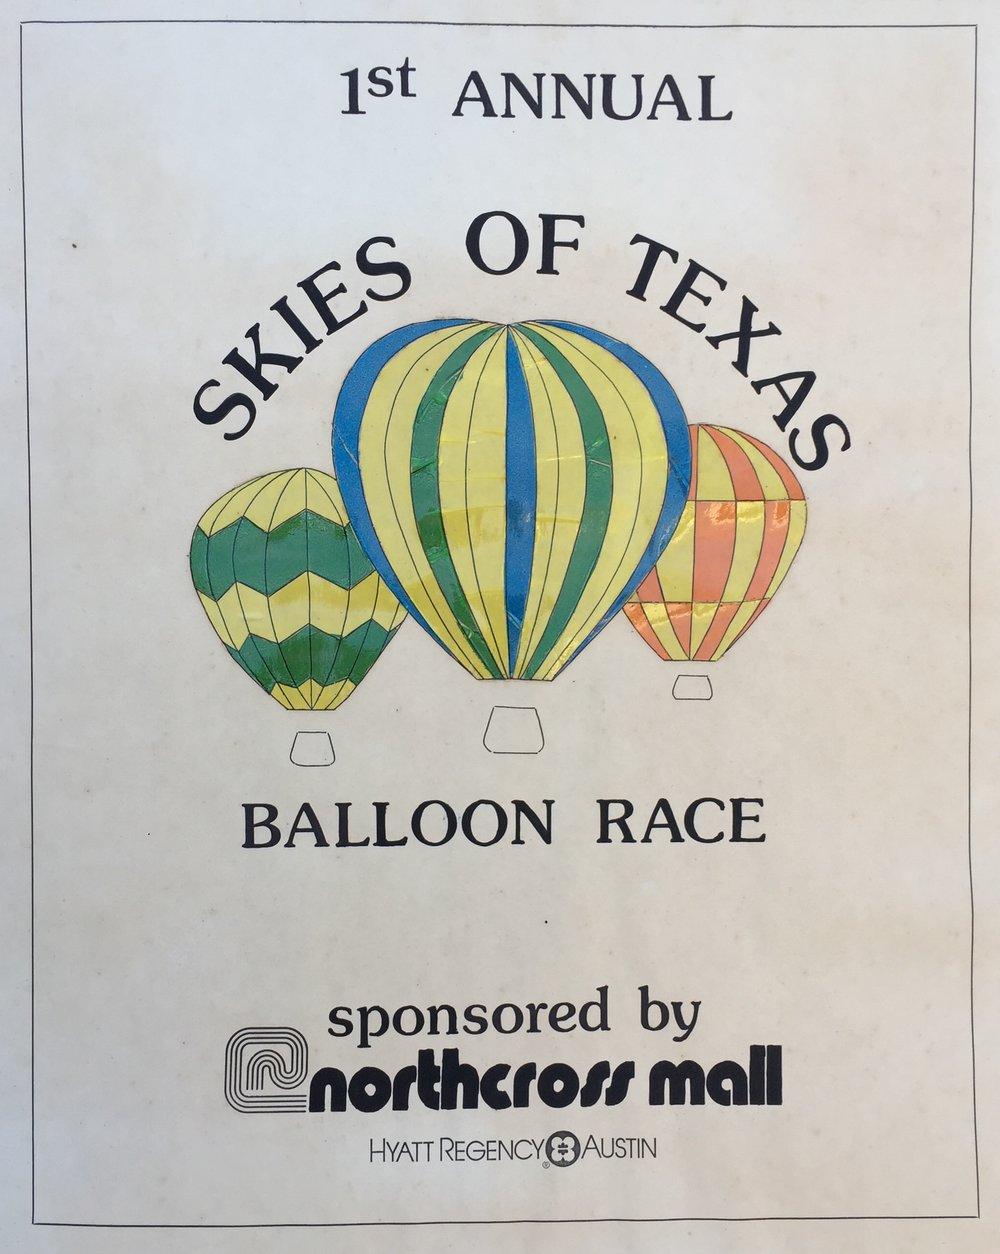 Skies of Texas Balloon Race 1983